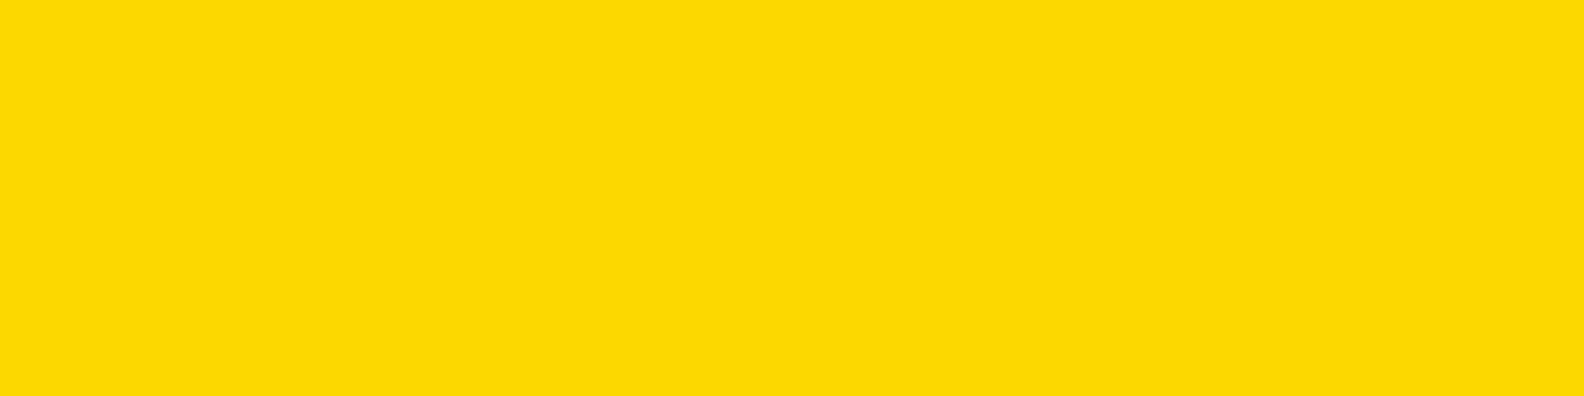 1584x396 Gold Web Golden Solid Color Background